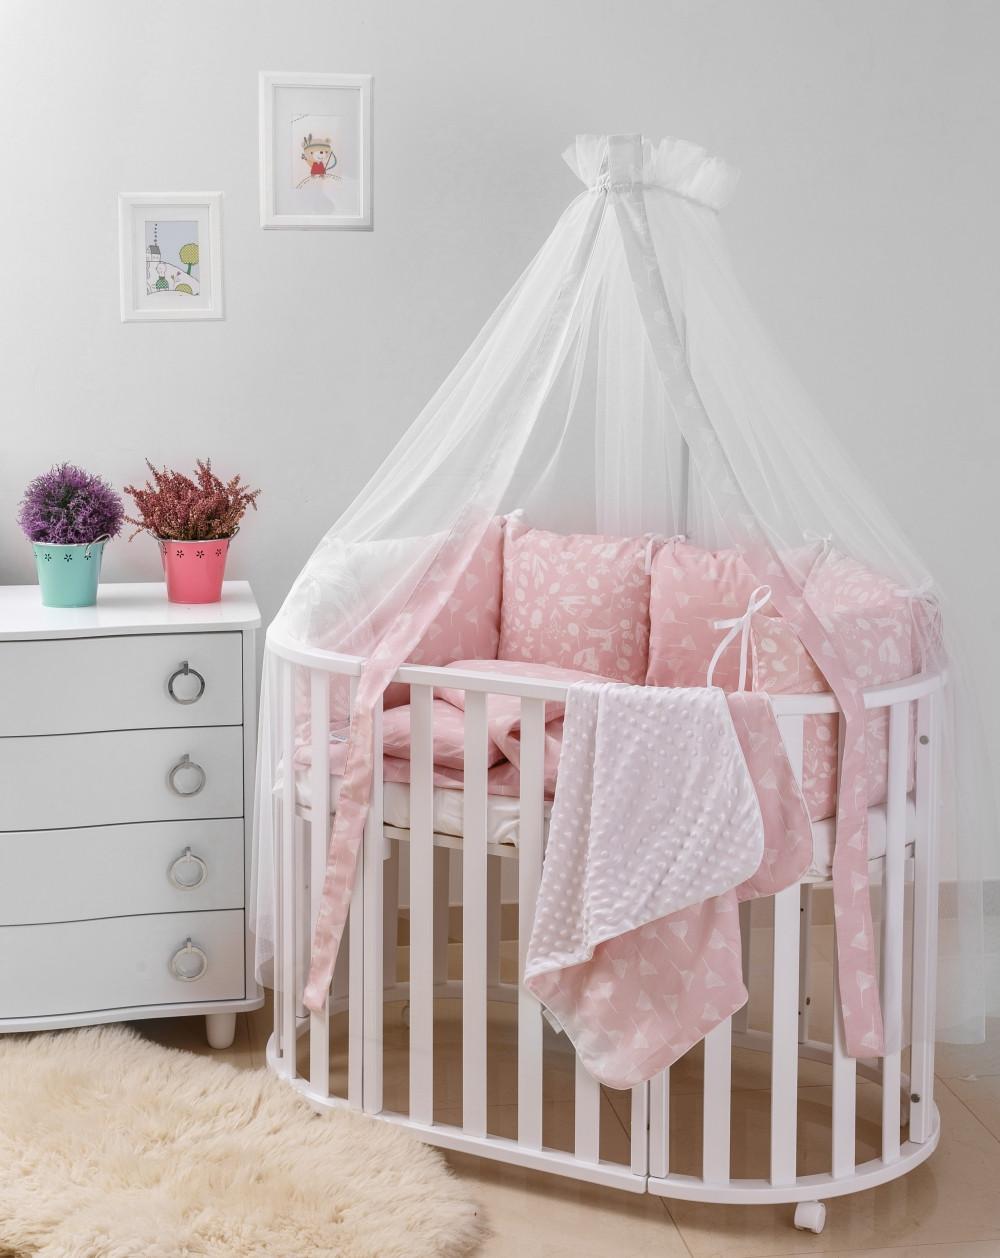 Детская постель Twins Dolce D-013 Лісові мешканці 8 ел pink